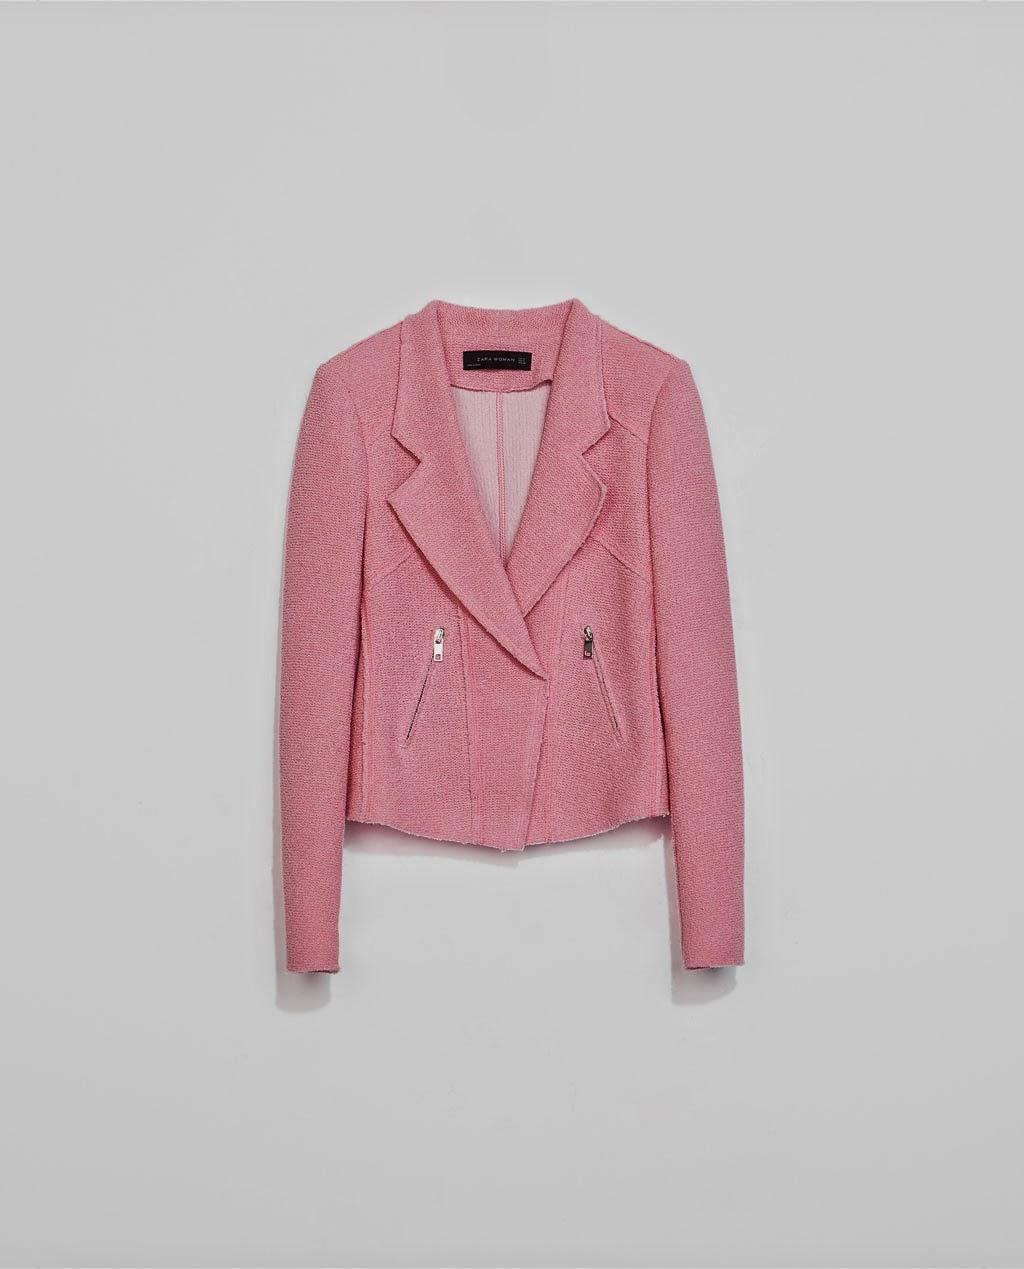 Pink jacket, Zara, street style, fashion style